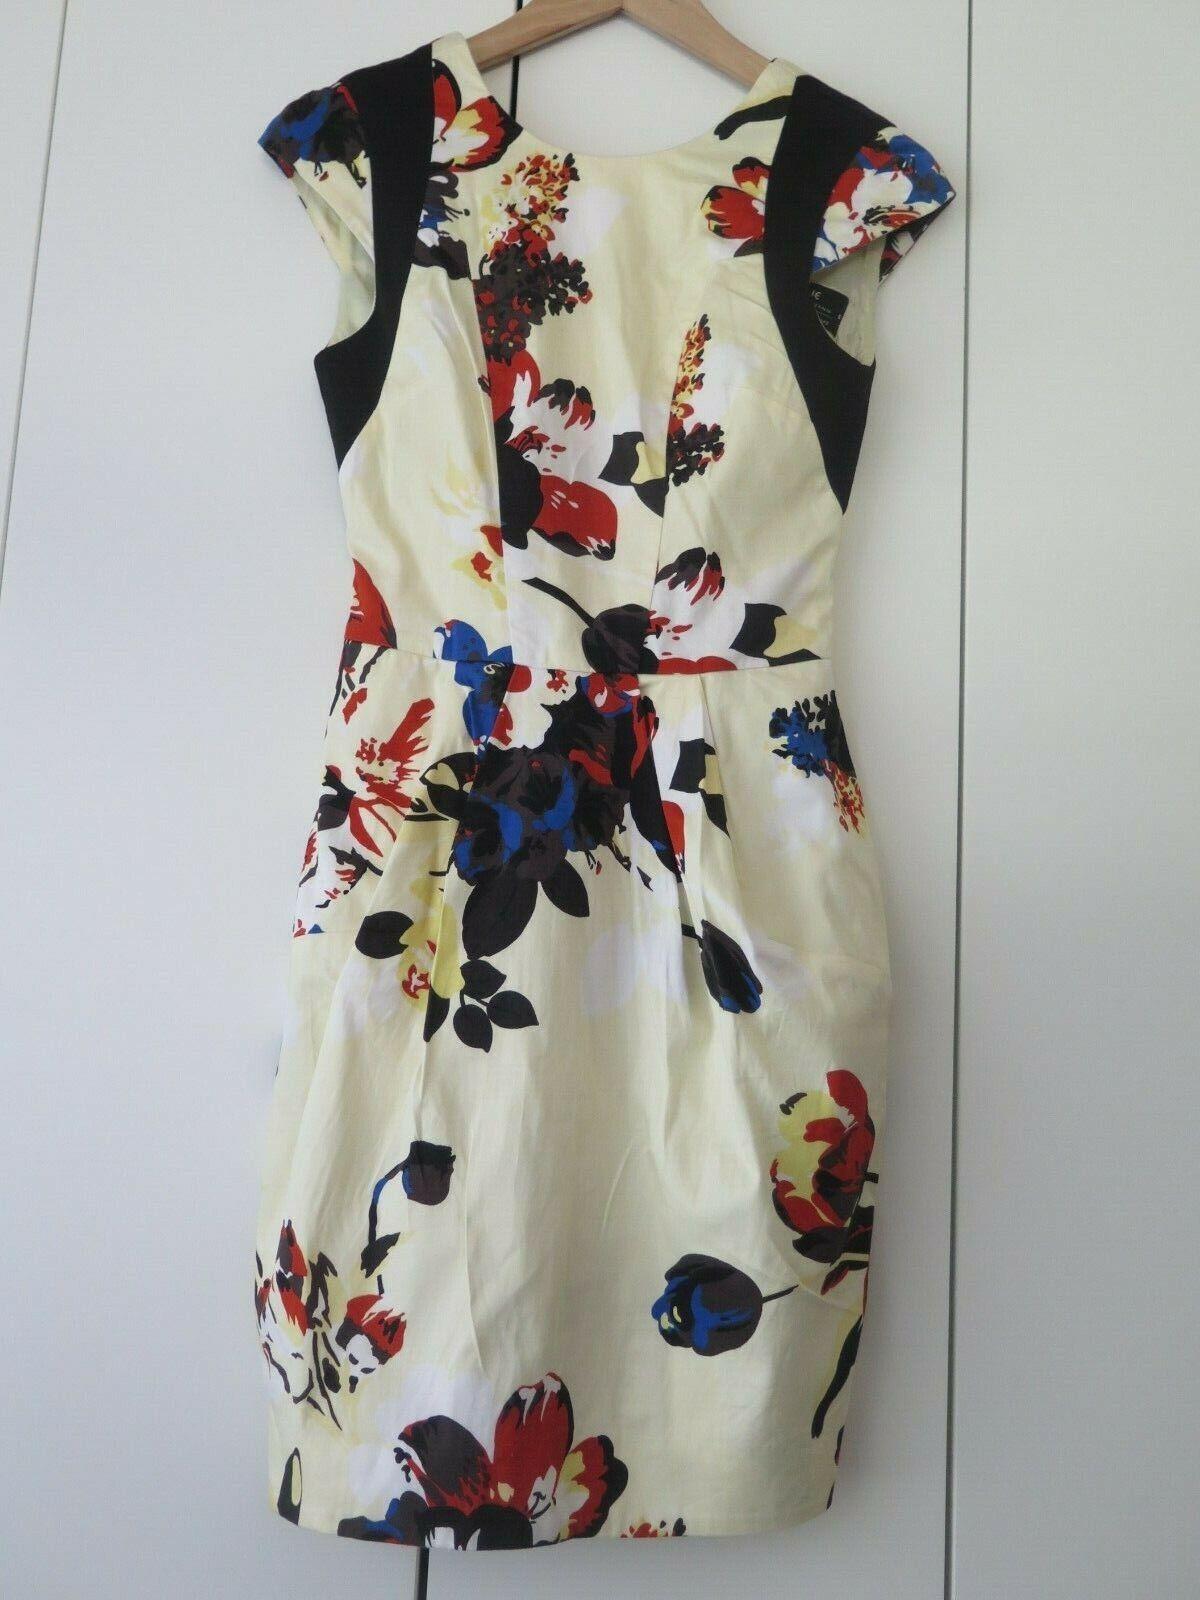 CUE Sz 6 Lemon Abstract Print Dress with schwarz Contrast EC -Exclusive Cue Print